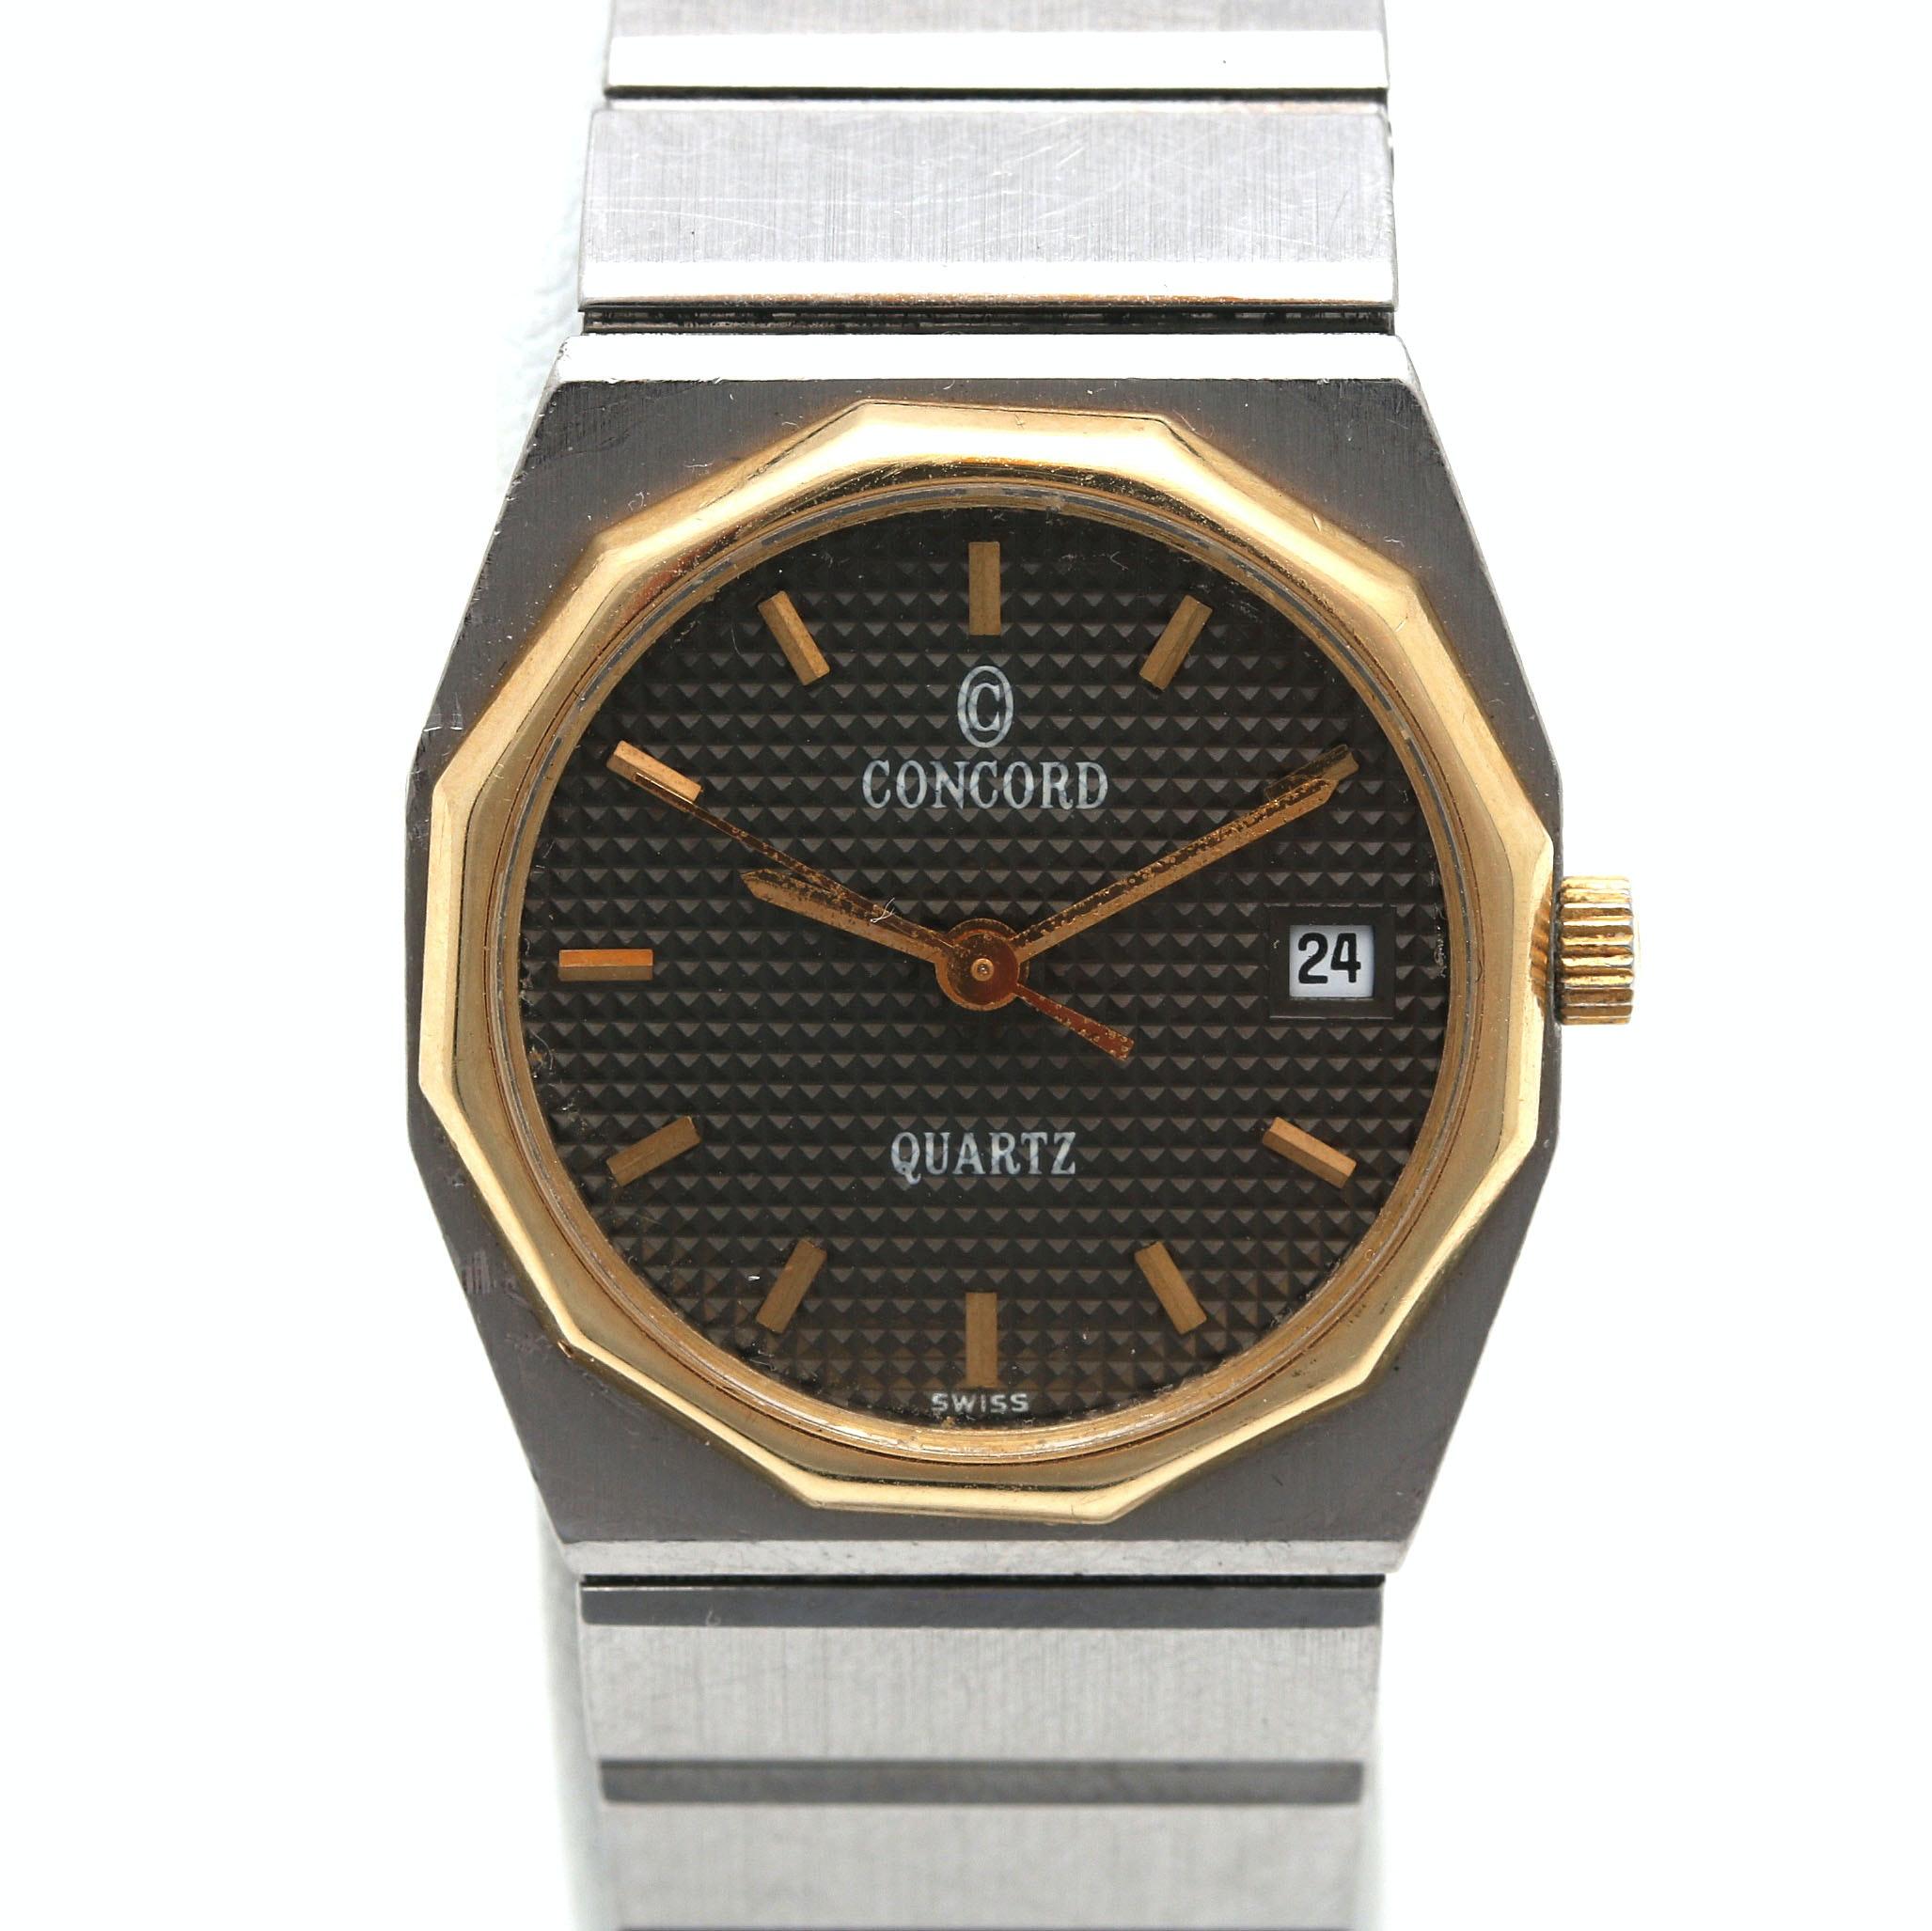 Concord Quartz Watch